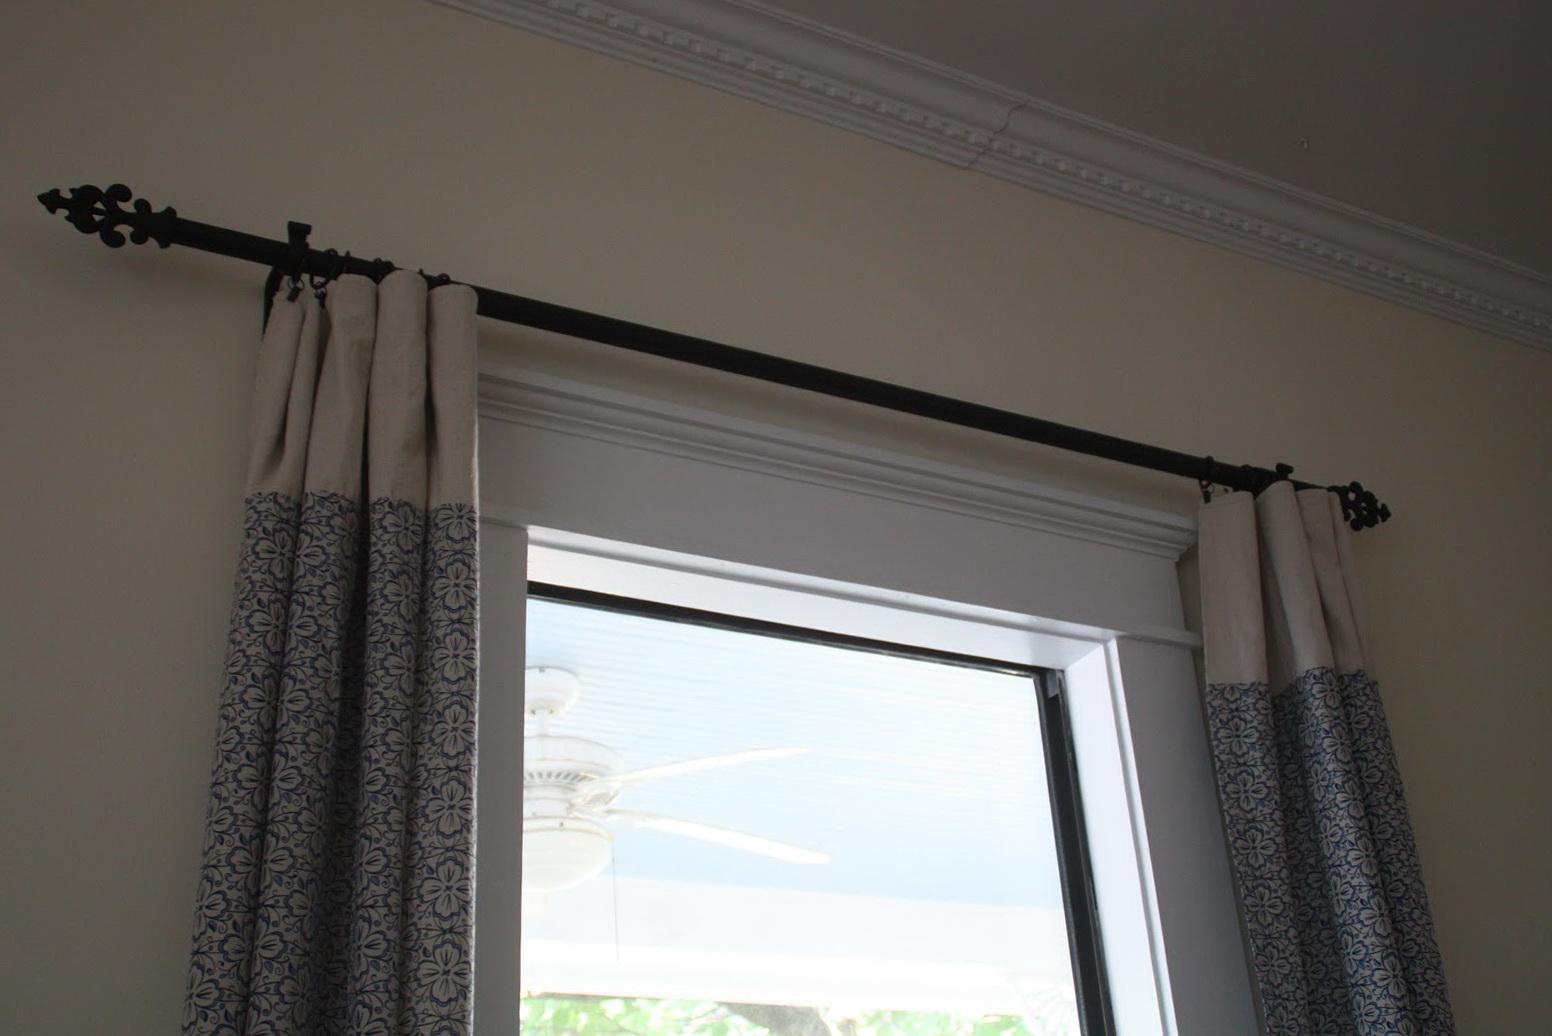 Restoration Hardware Curtain Rod Home Design Ideas